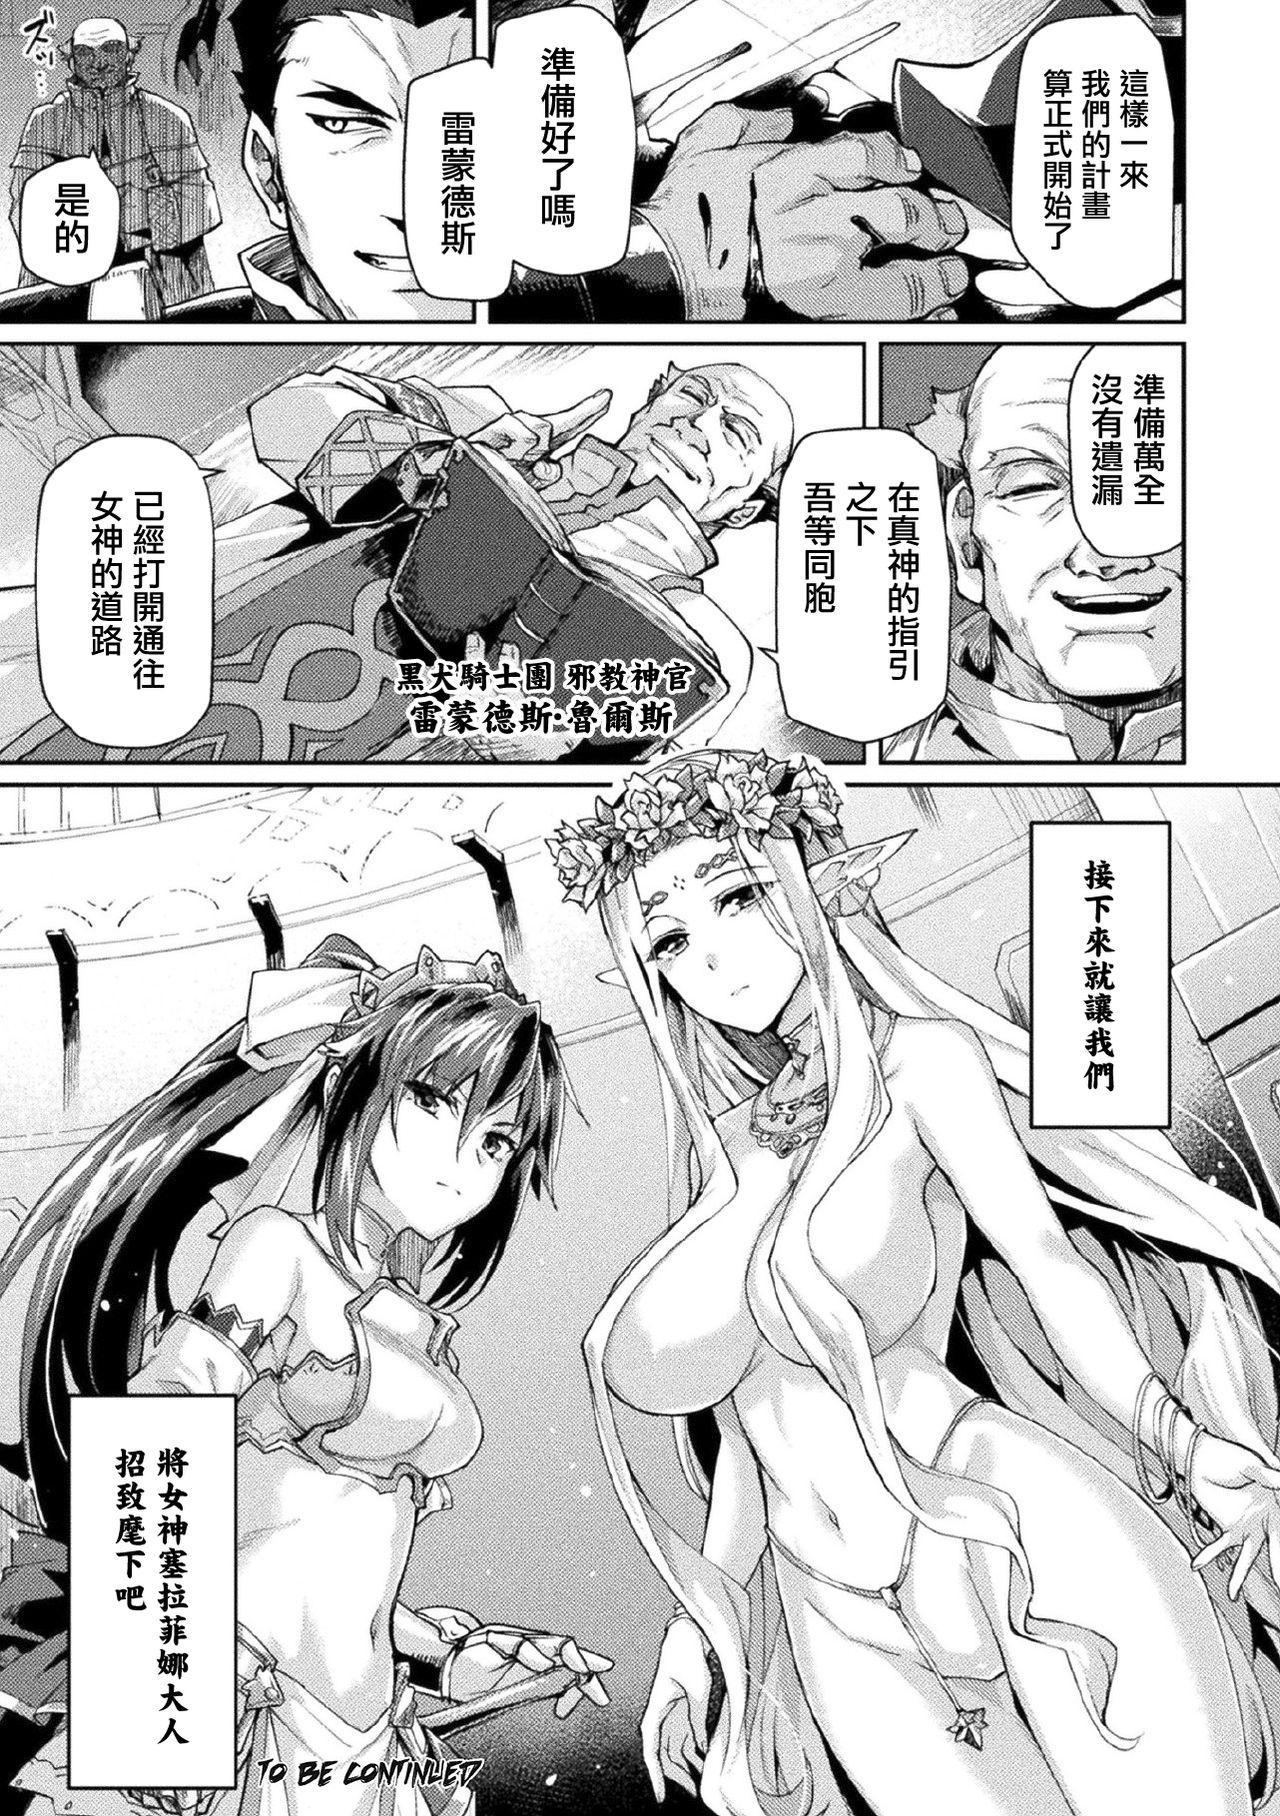 [Tsukitokage] Kuroinu II ~Inyoku ni Somaru Haitoku no Miyako, Futatabi~ THE COMIC Chapter 6 (Kukkoro Heroines Vol. 7) [Digital] [Chinese] [鬼畜王漢化組] [Digital] 22